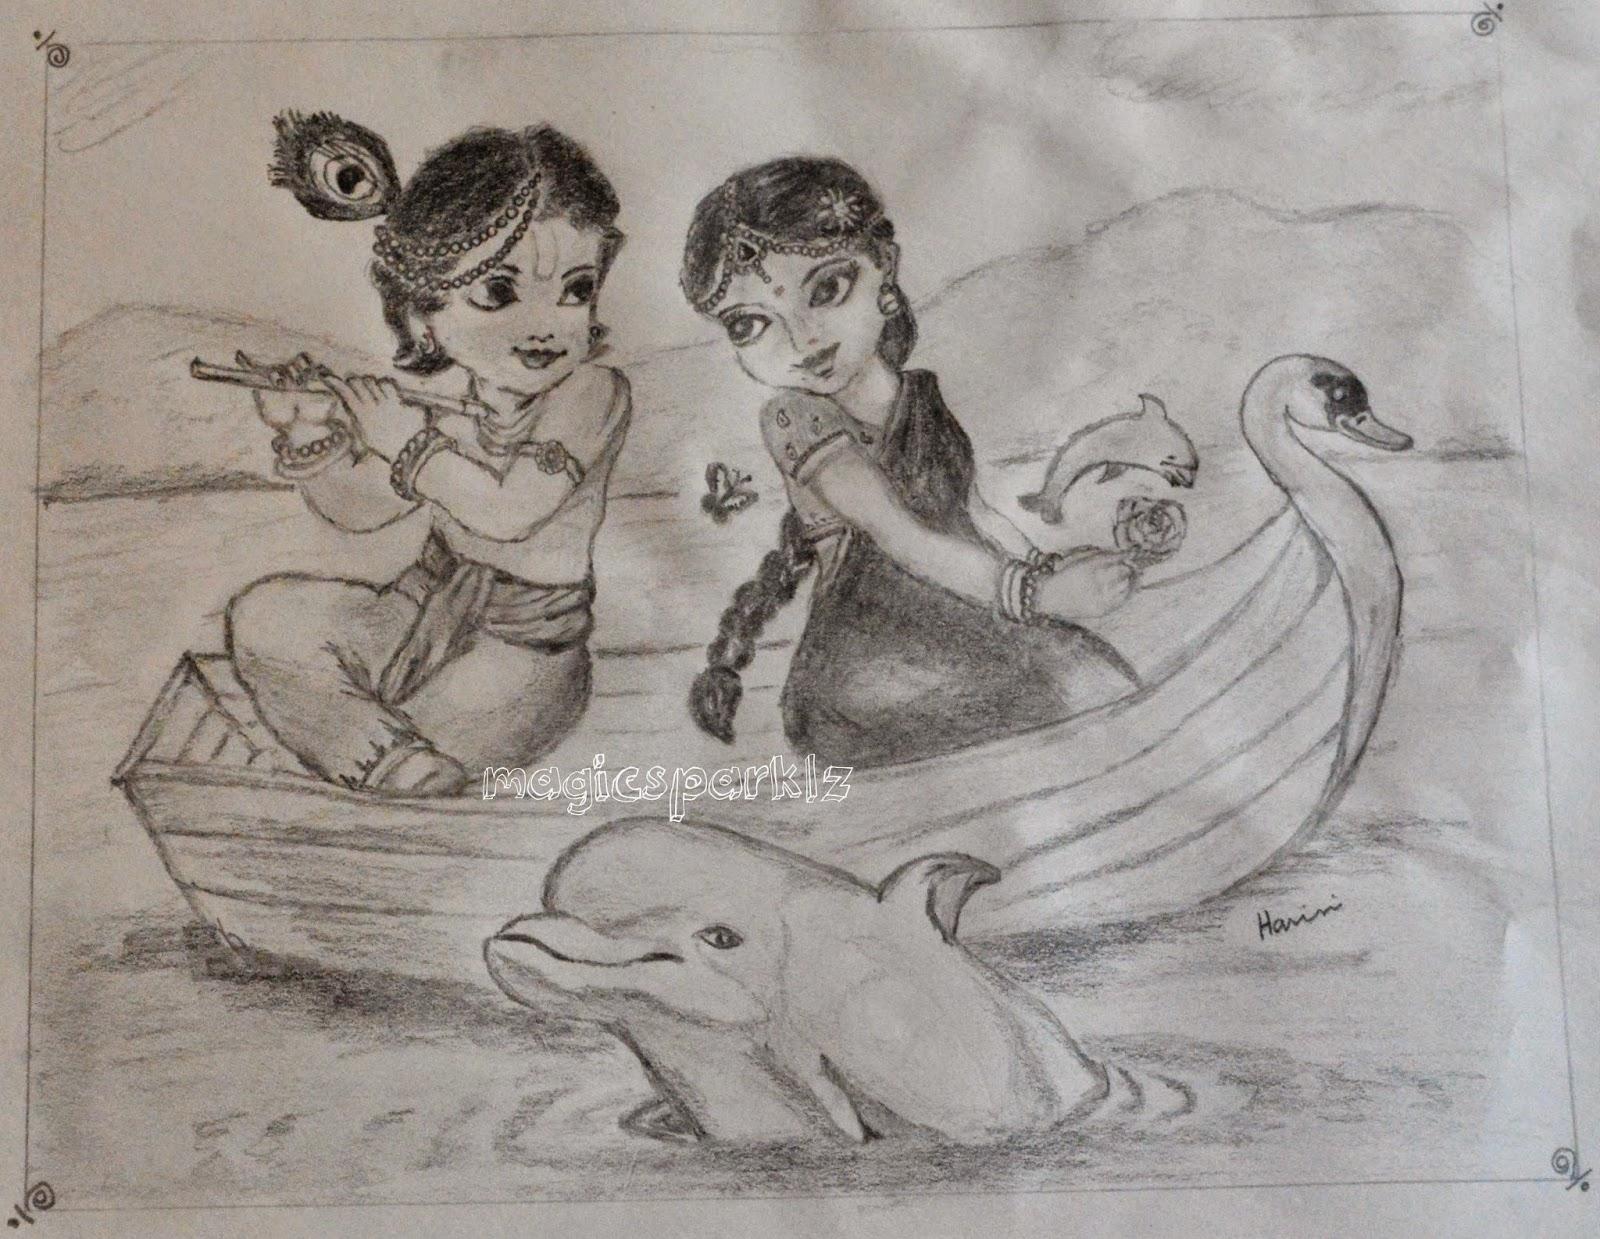 pencil sketch Radhakrishna